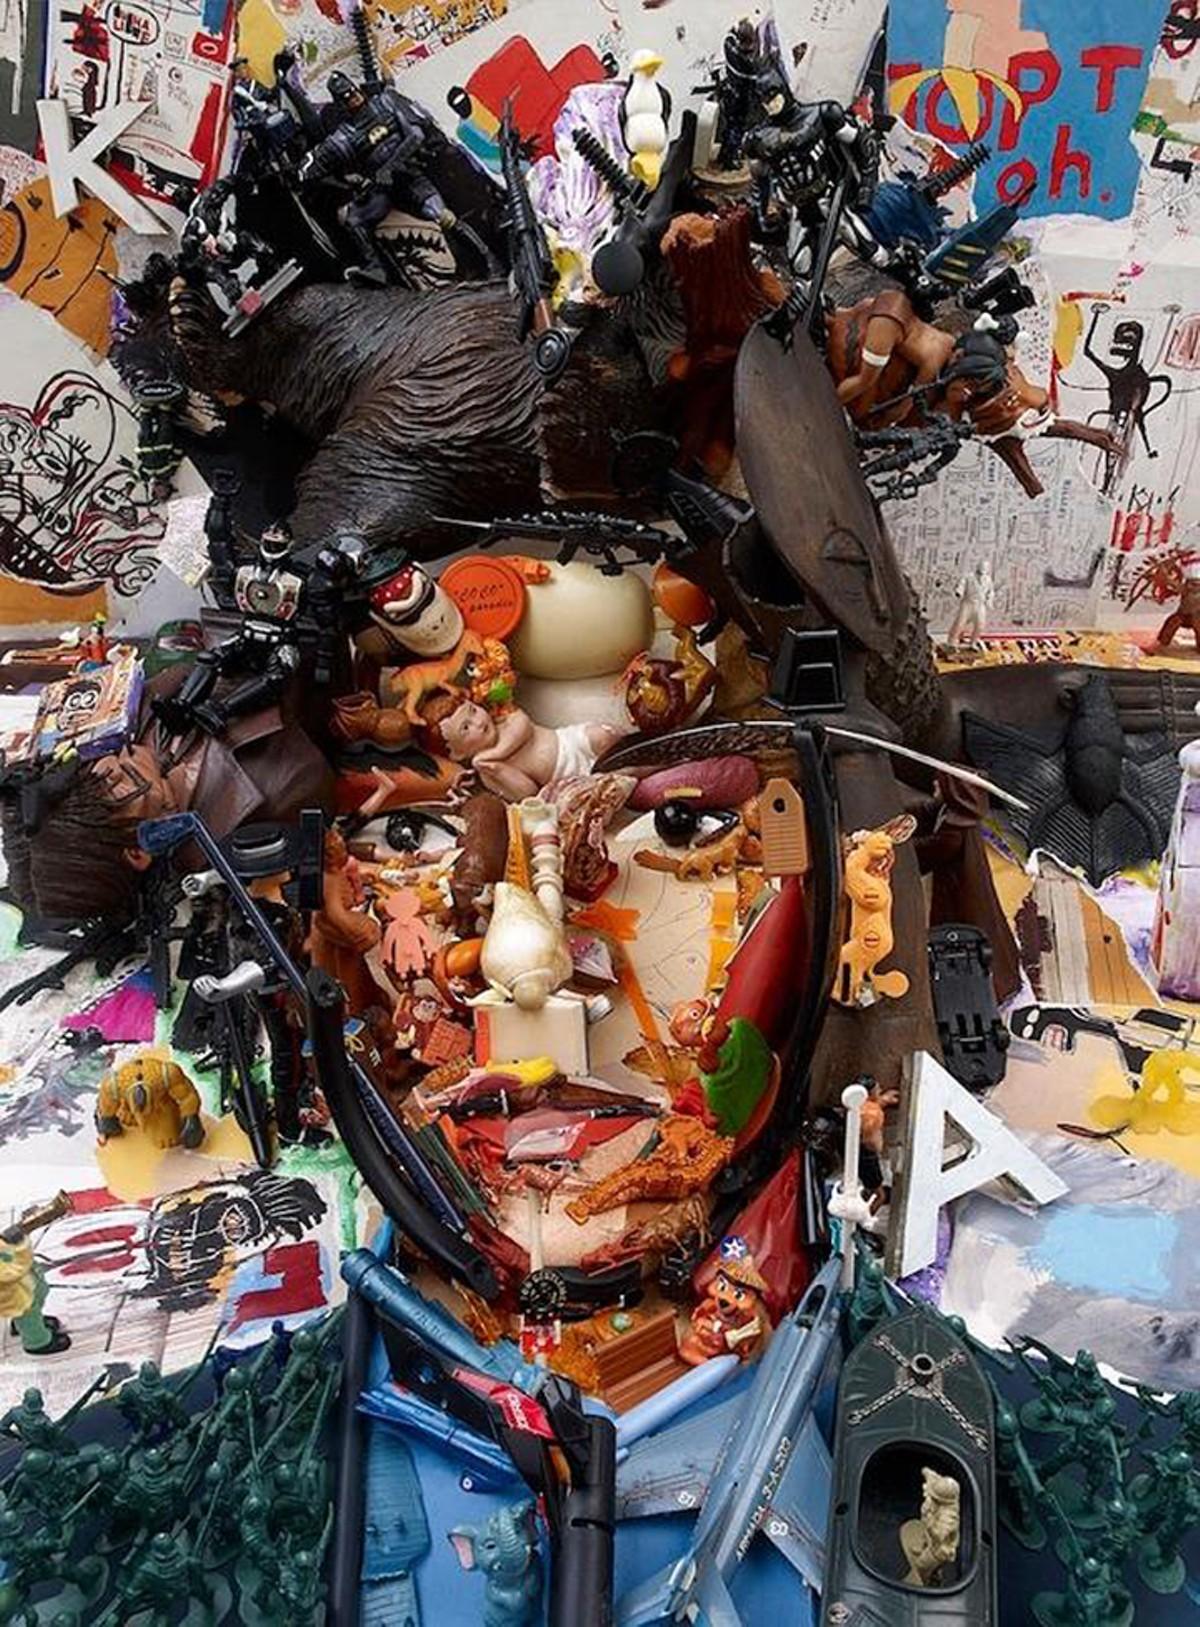 gal_hello_basquiat.jpg